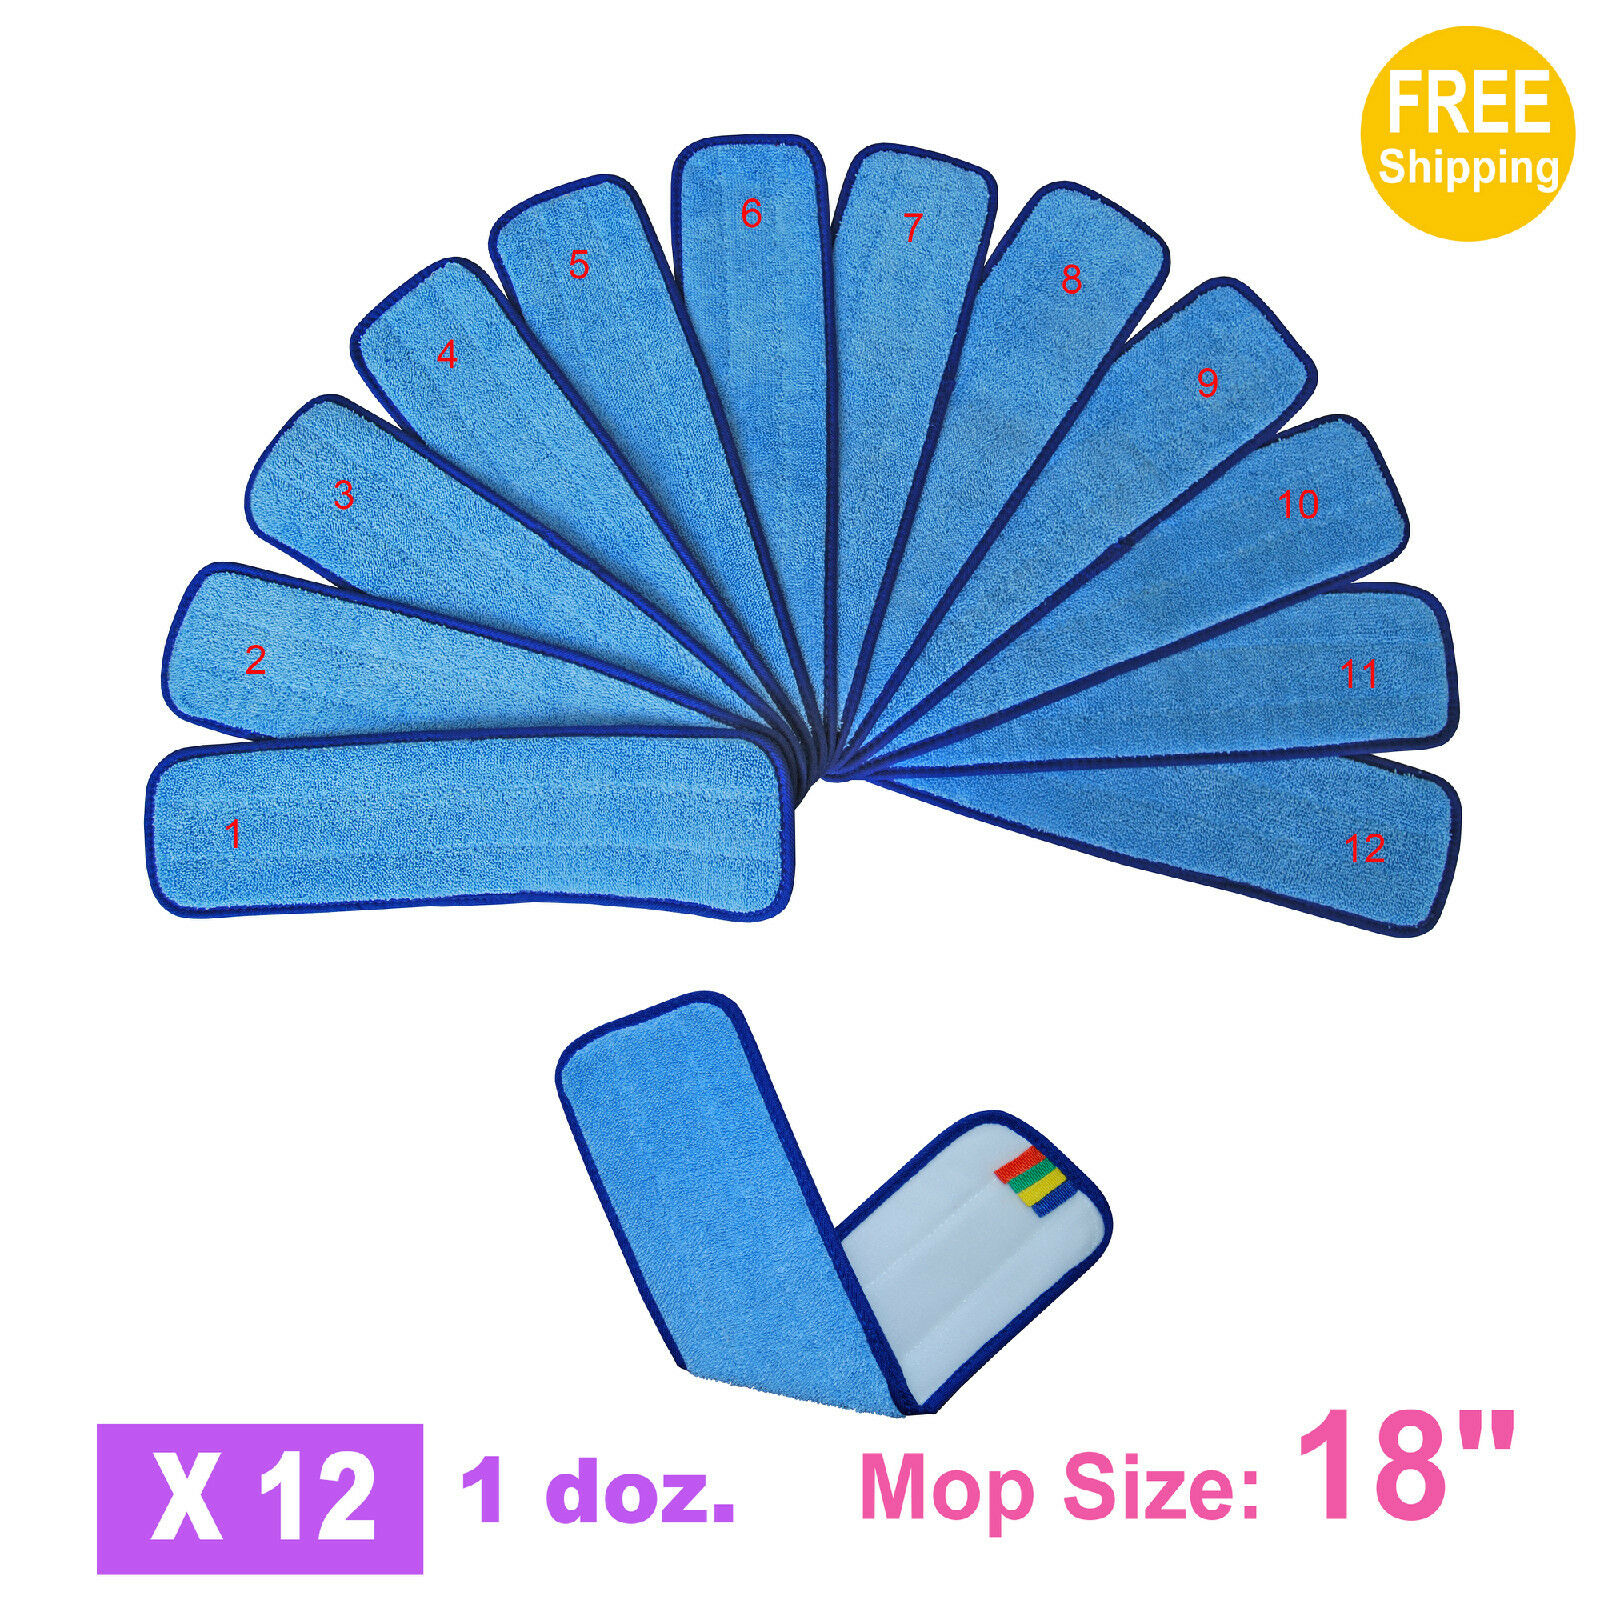 1doz. 18  SunnyCare bluee Microfiber Damp Room Mops Pad 12pcs